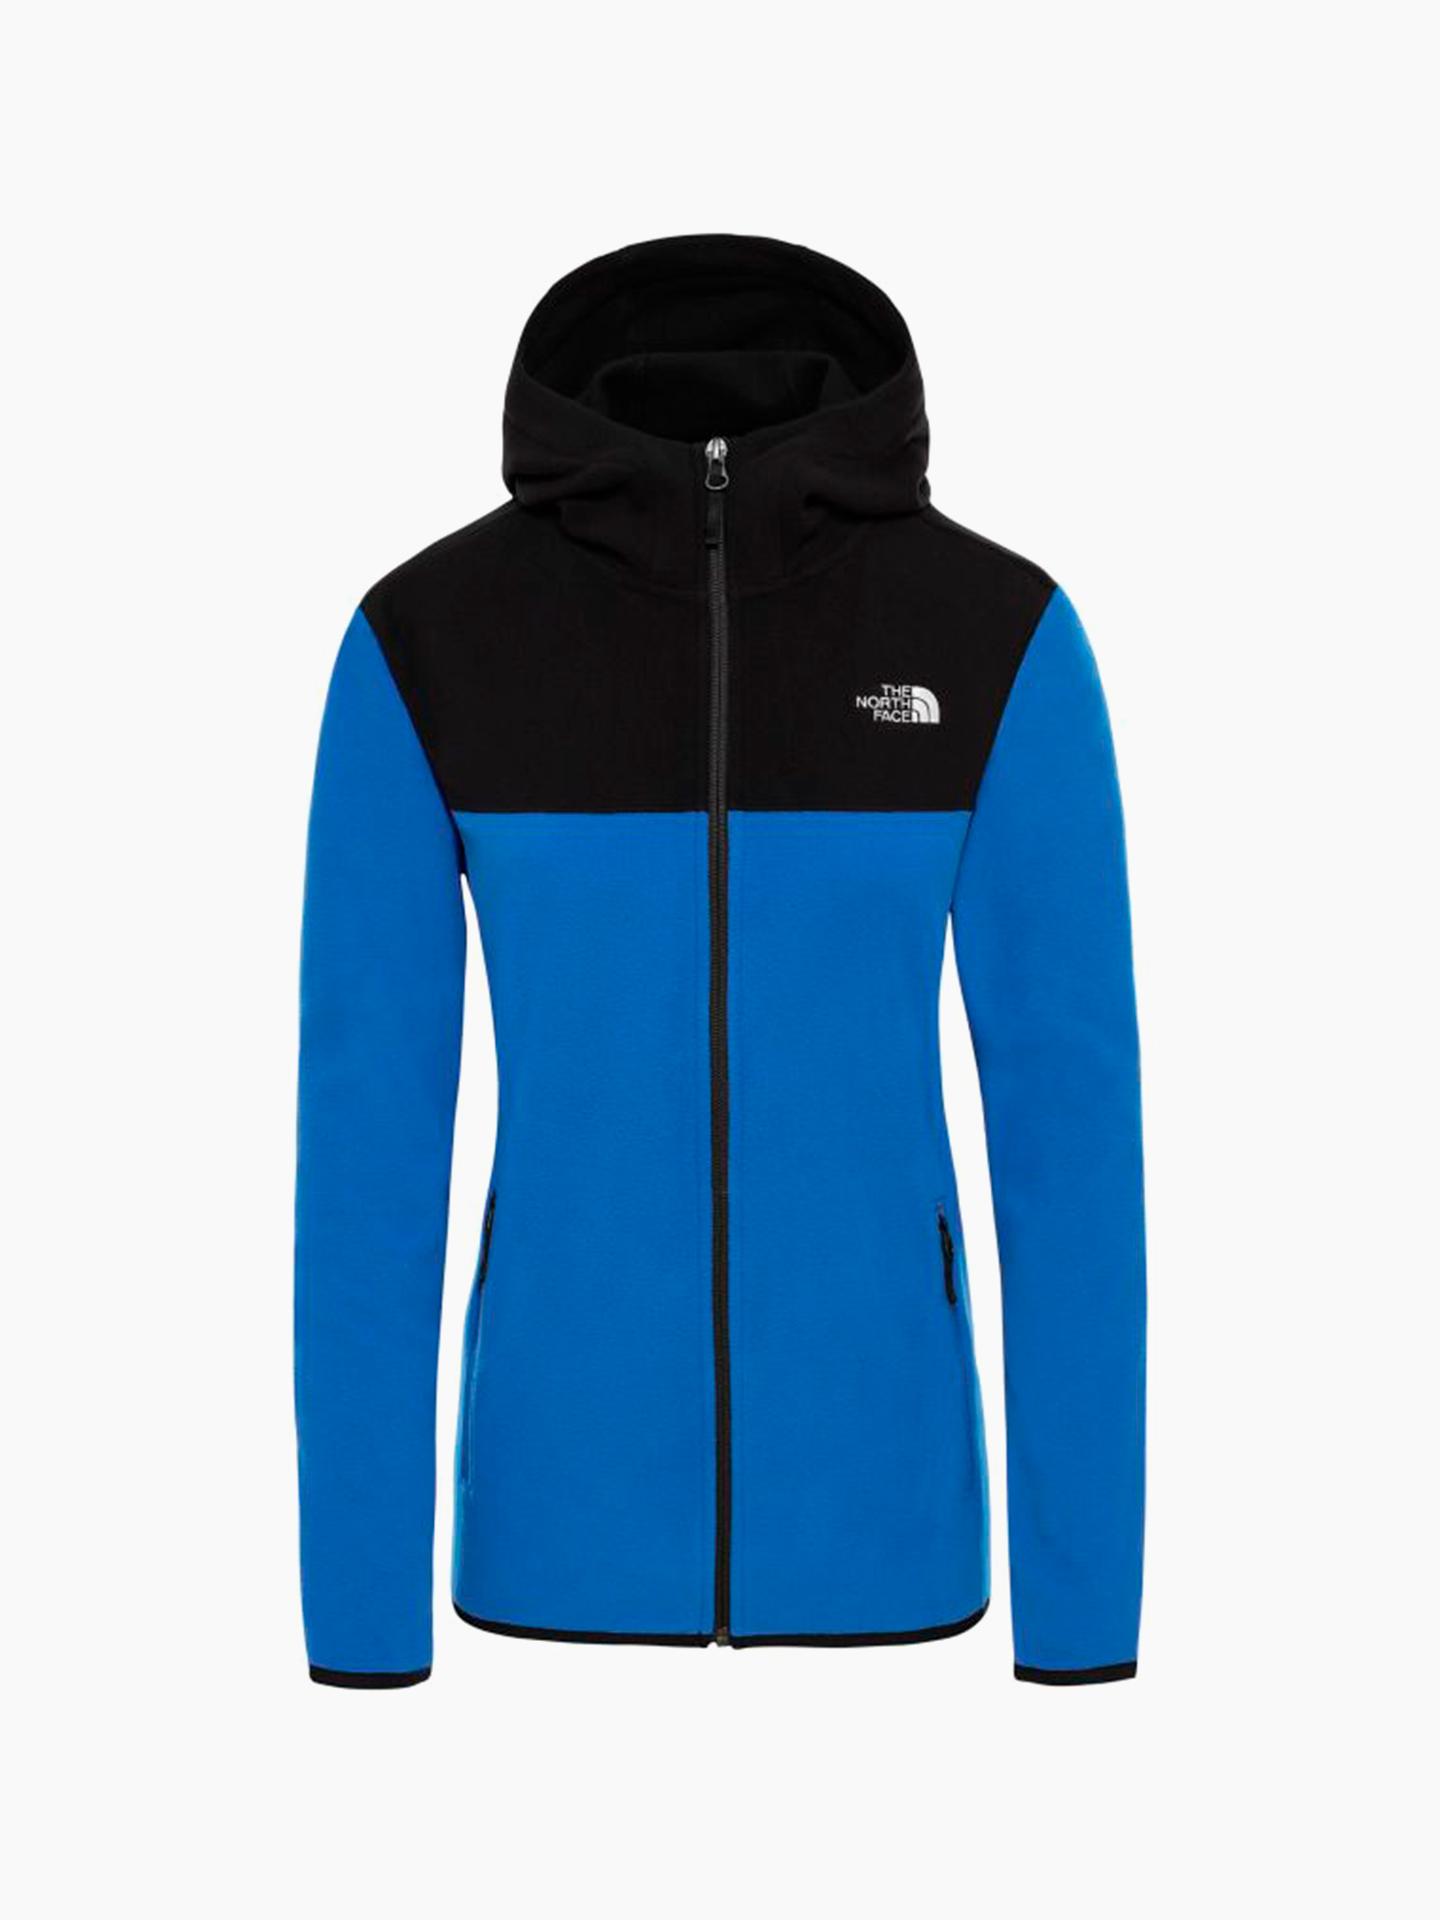 Женская куртка The North Face Tka Glacier Full Zip Hooded Fleece